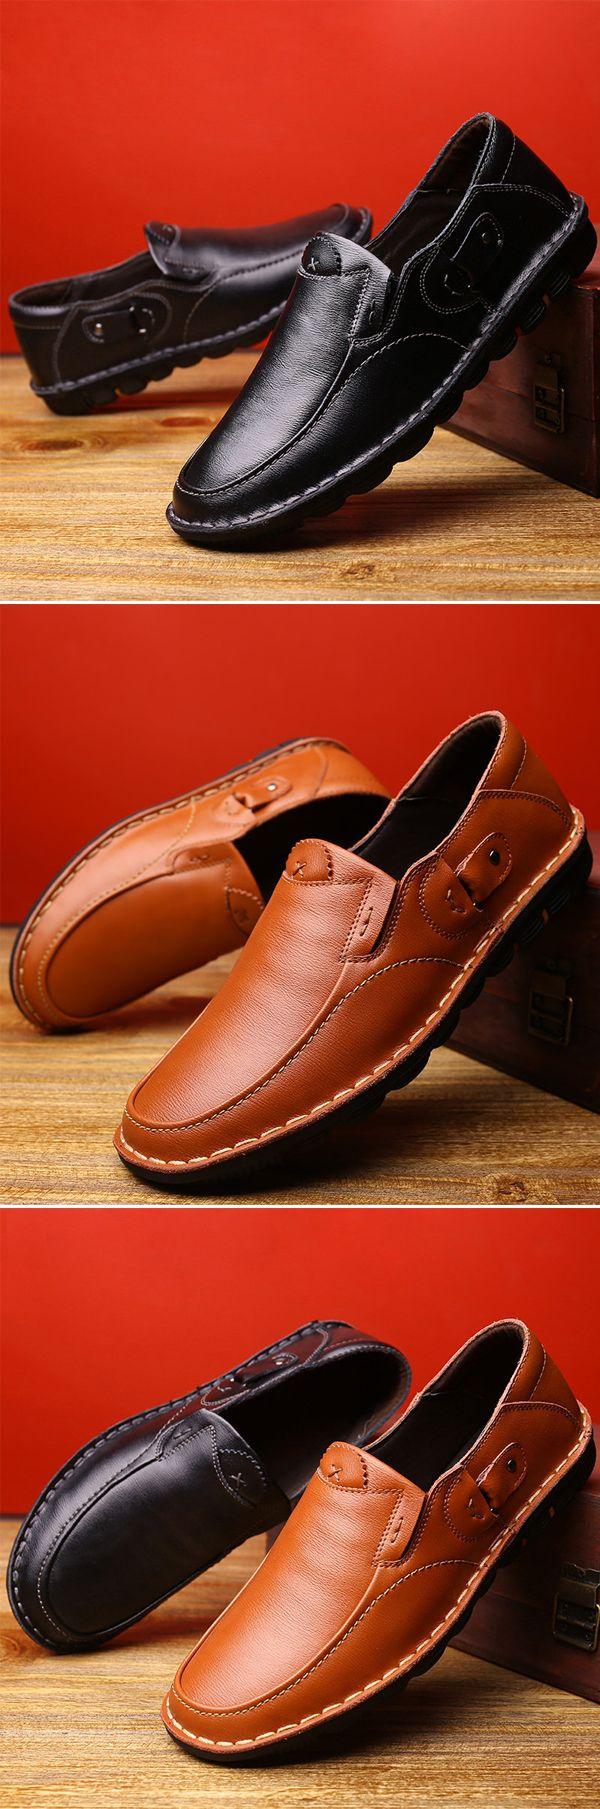 Best 25 Casual Shoes Online Ideas On Pinterest Cheap Flat Shoes